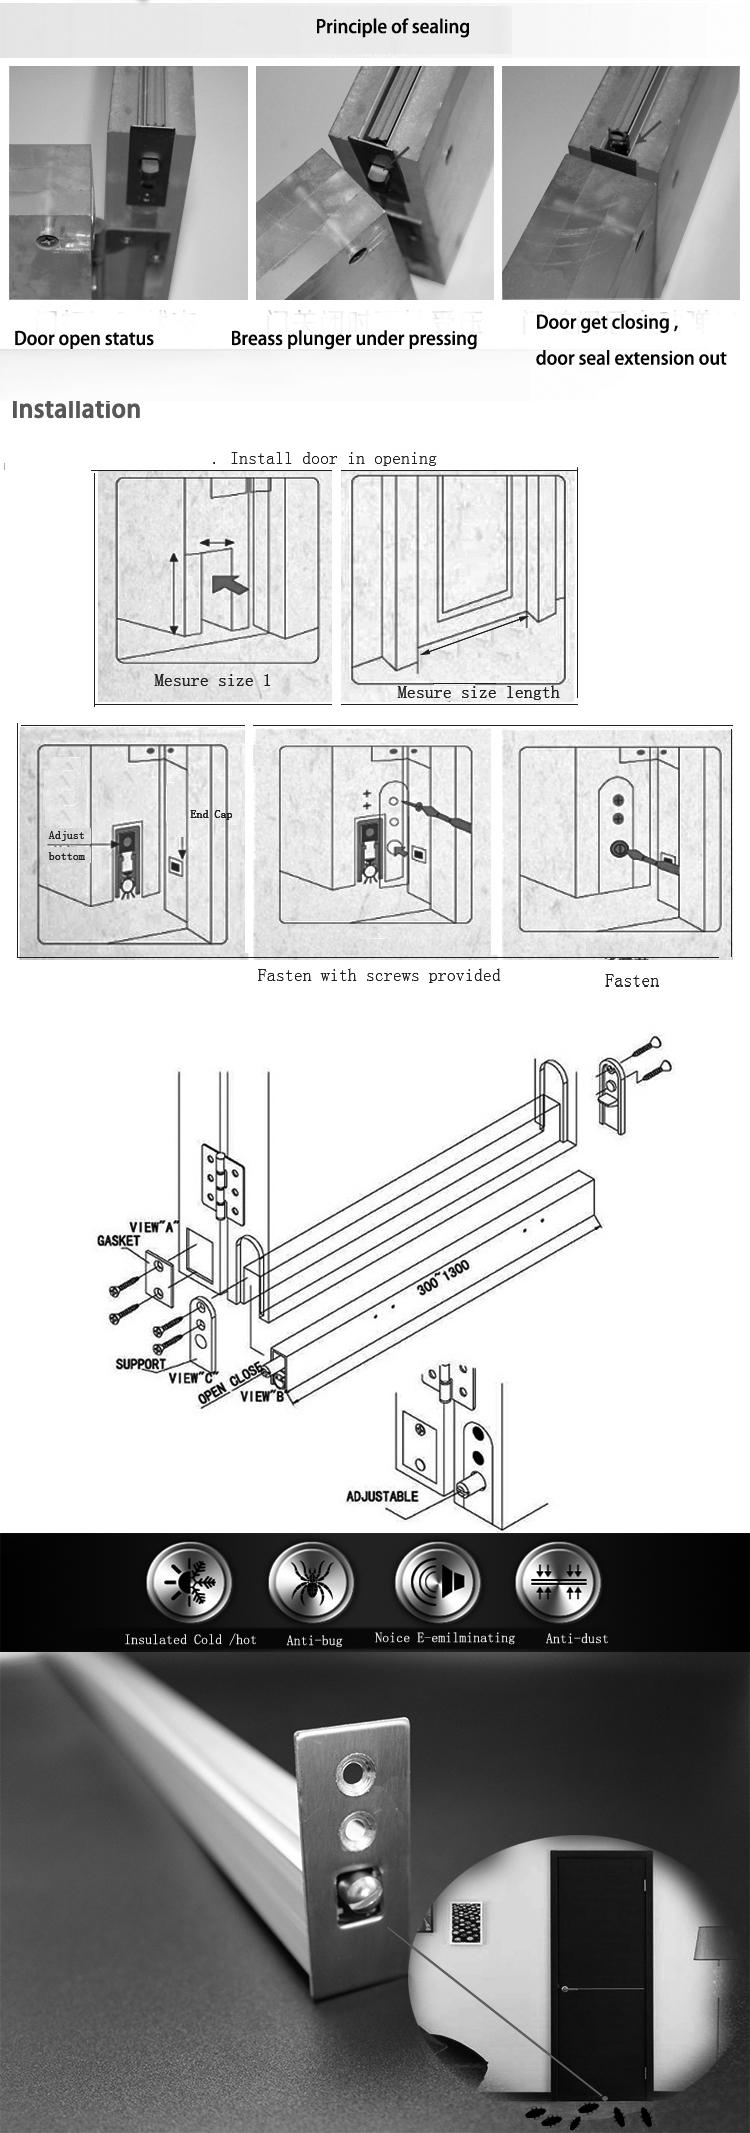 Mortised concealed fix threshold aluminium threshold automatic door bottom seal